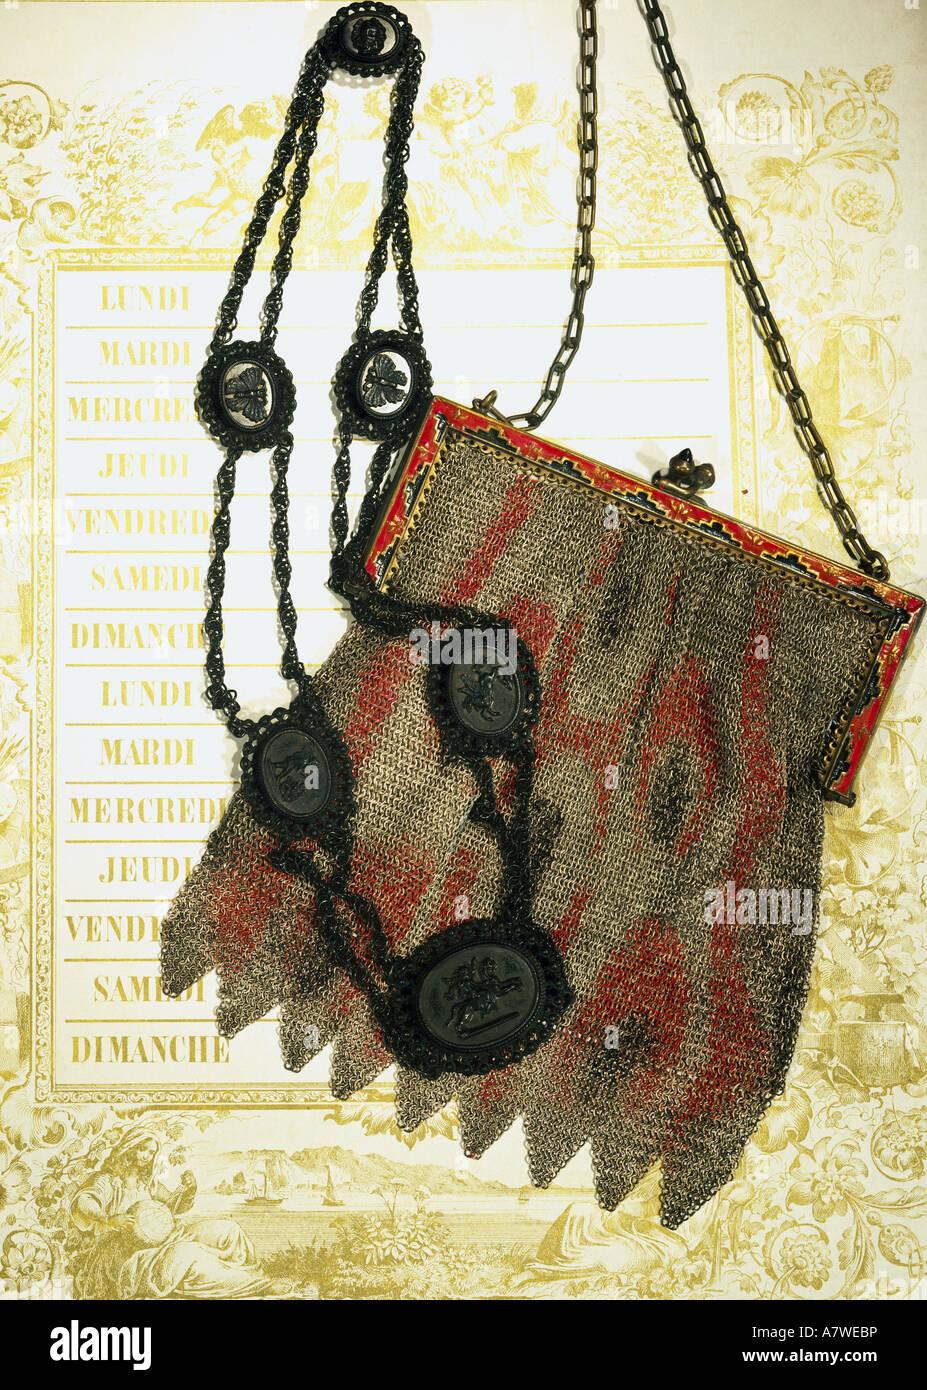 handbags, handbag made of knitted iron threads, circa 1830/1840, with iron necklace, circa 1820/1830, Lehmann collection, - Stock Image